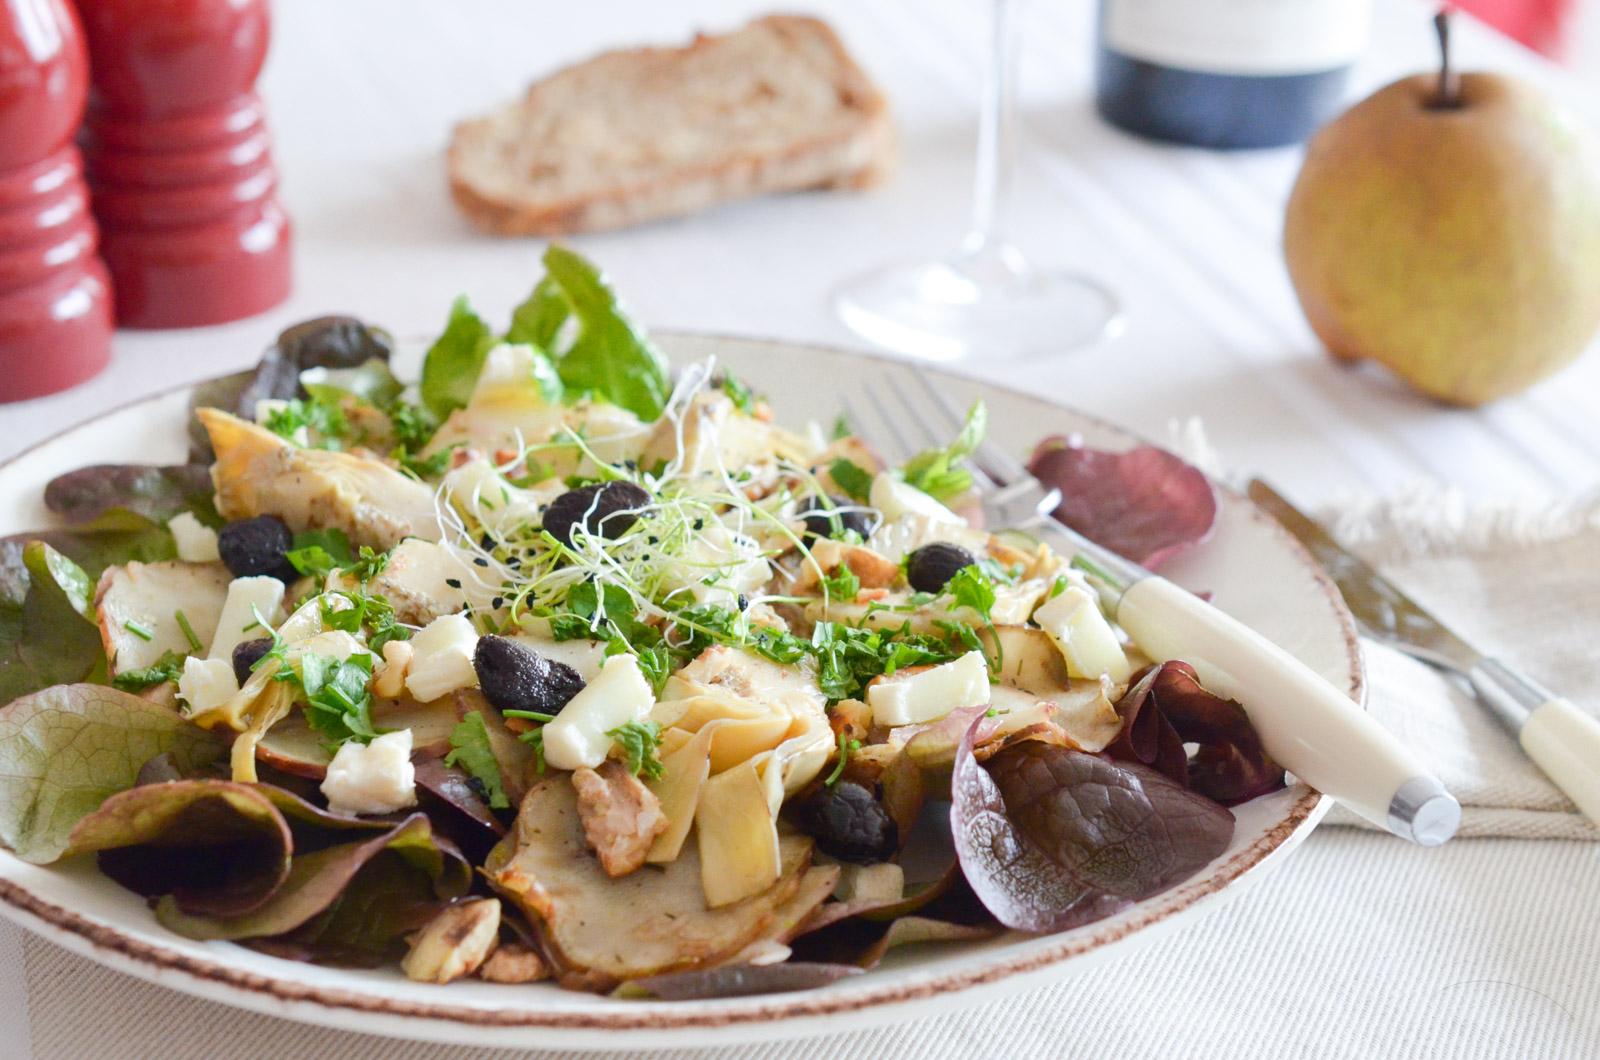 Salade Tiede Topinambours Artichauts (7 Sur 7)